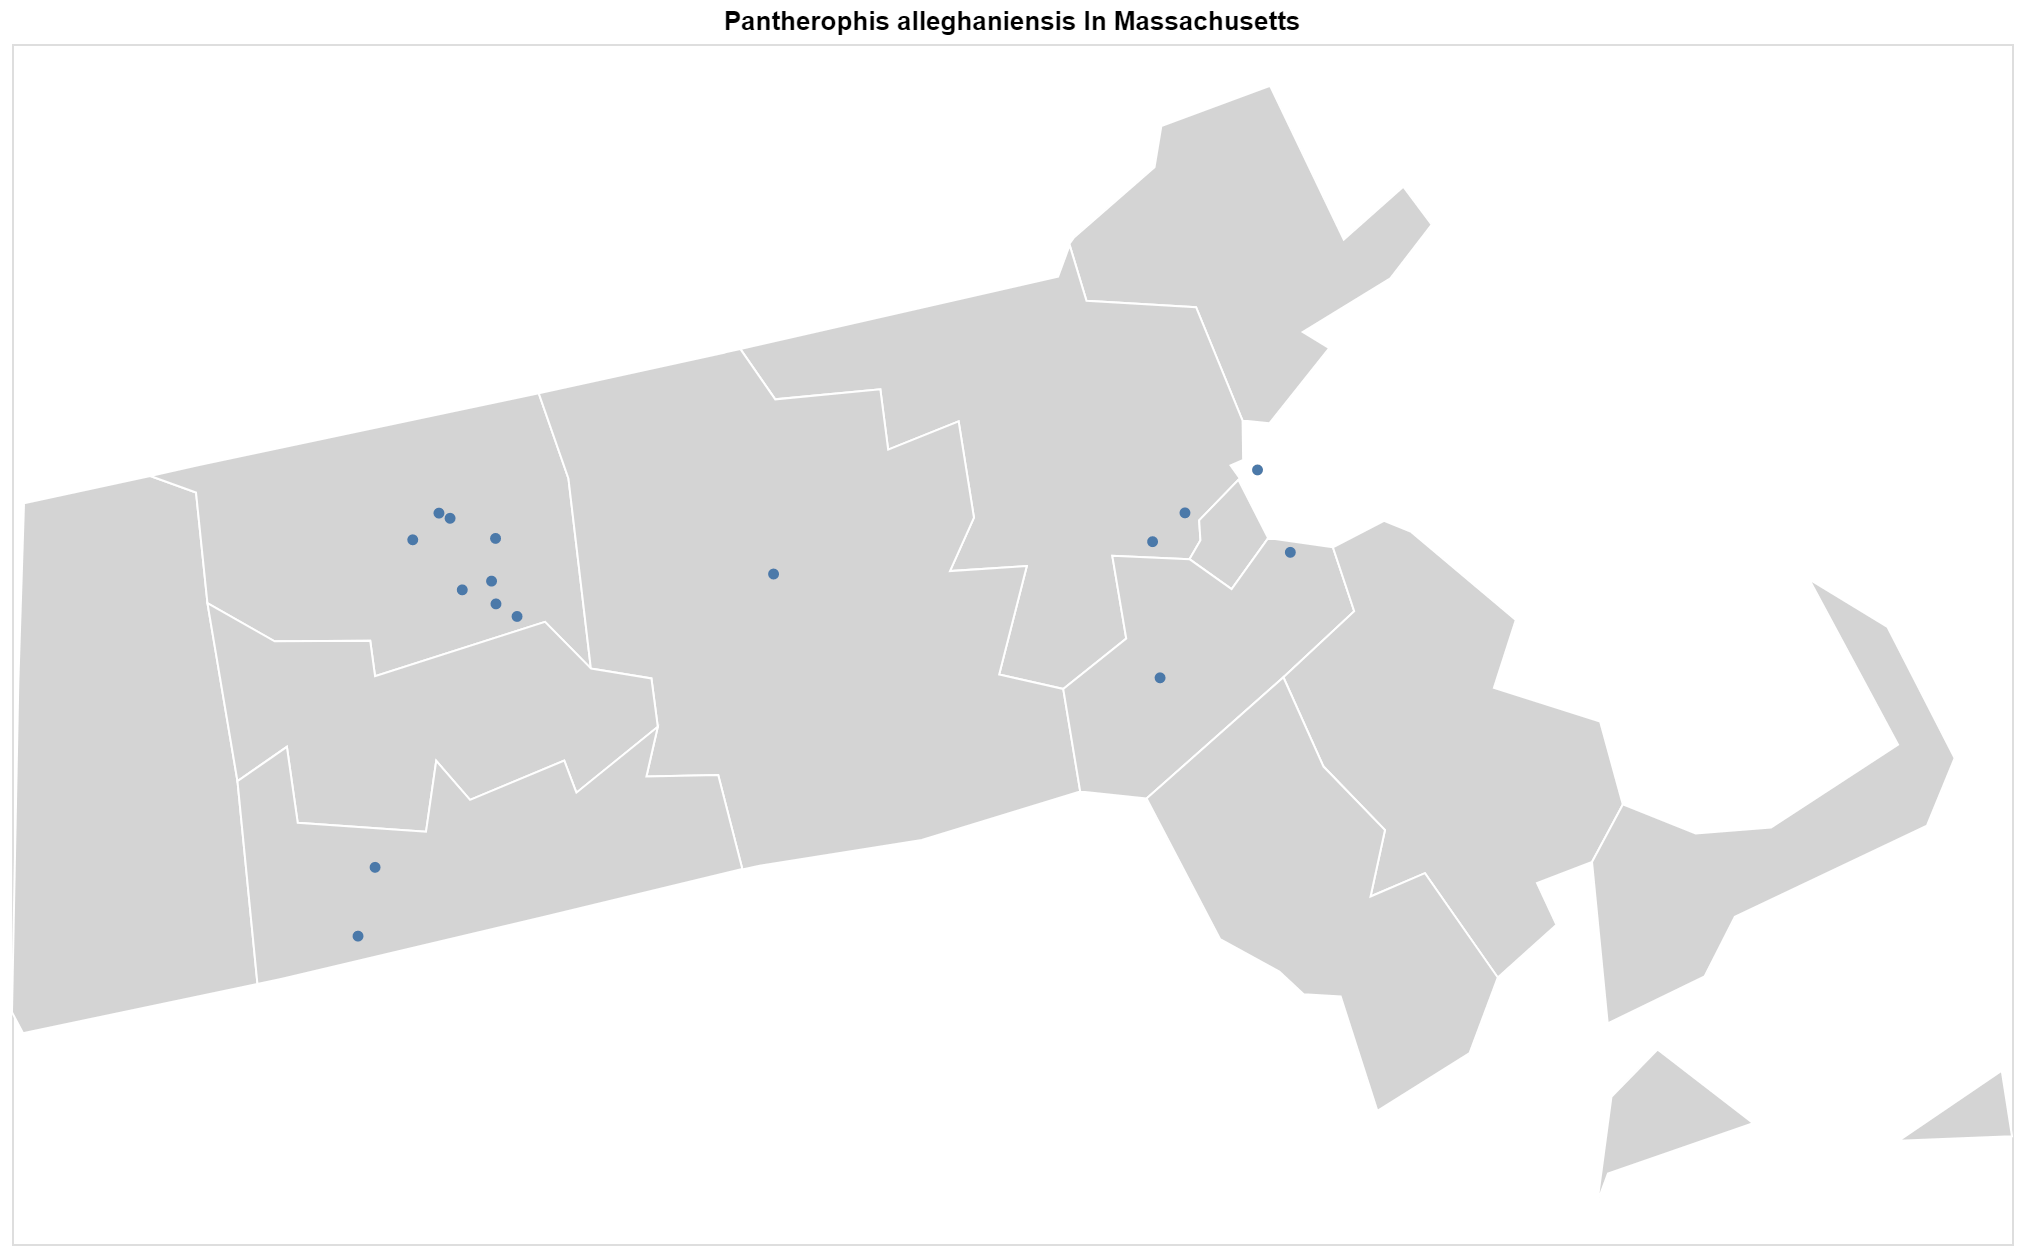 Pantherophis alleghaniensis Massachusetts map